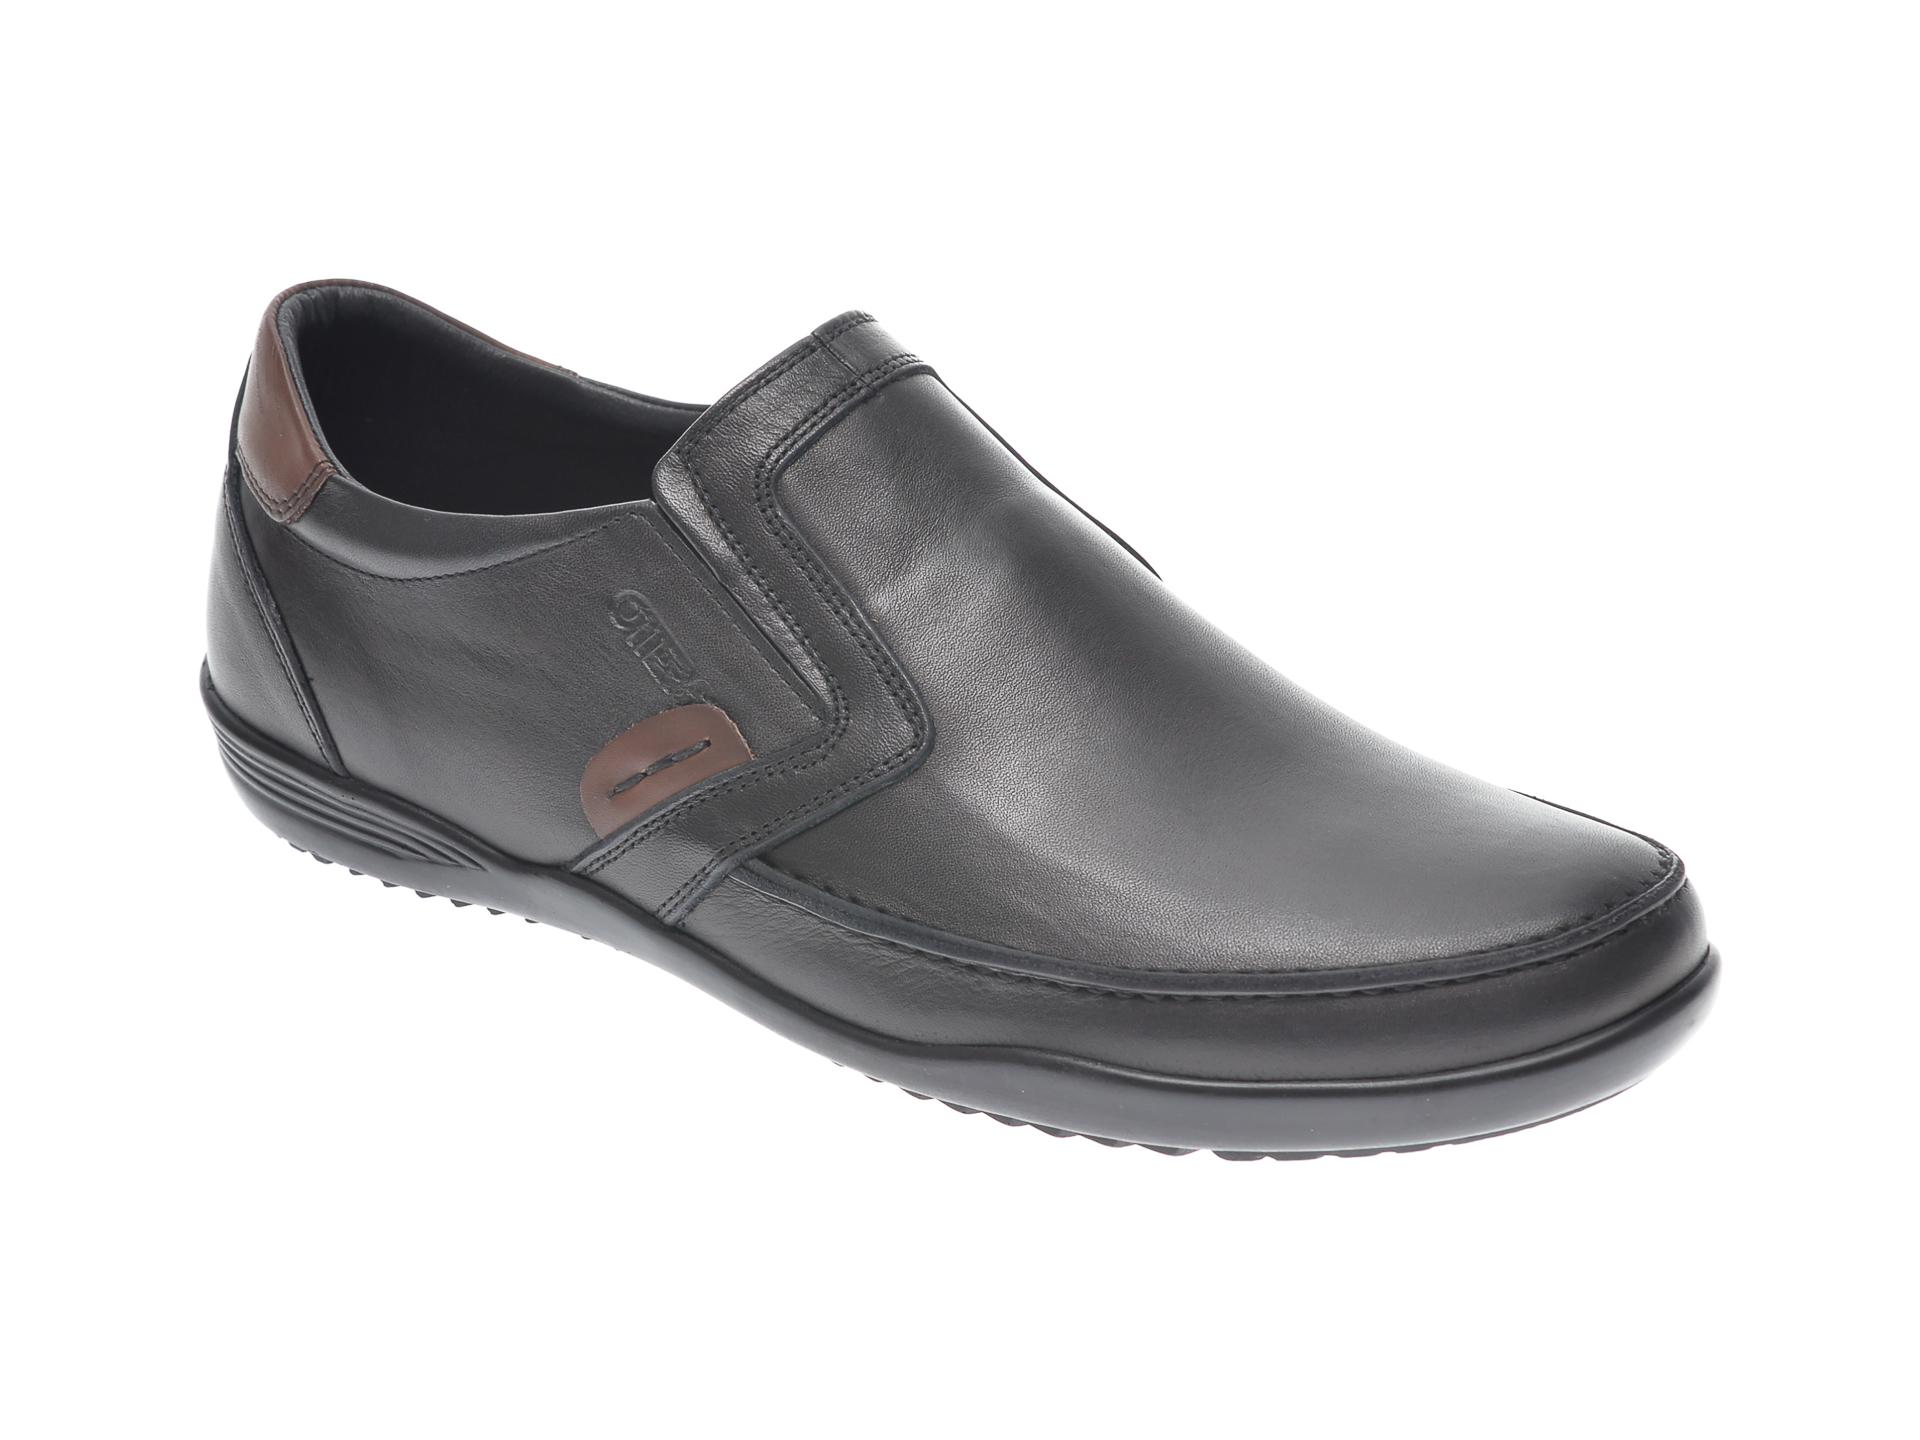 Pantofi OTTER negri, 220, din piele naturala New